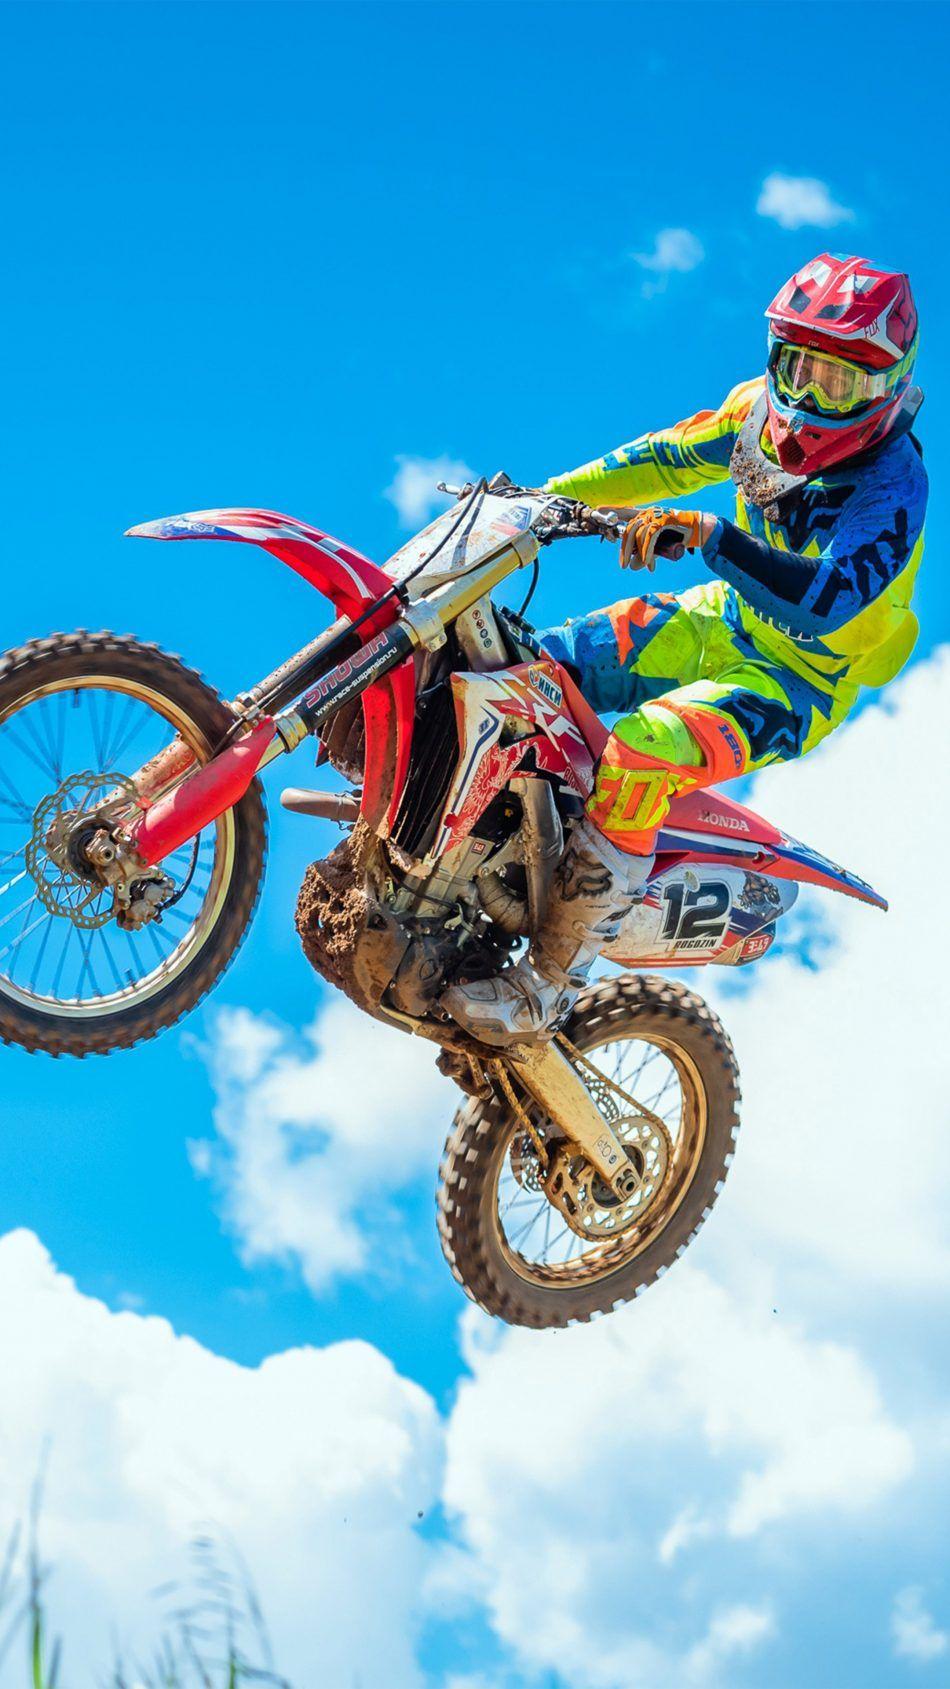 Motorcycle Motocross Sports Enduro motocross, Motocross